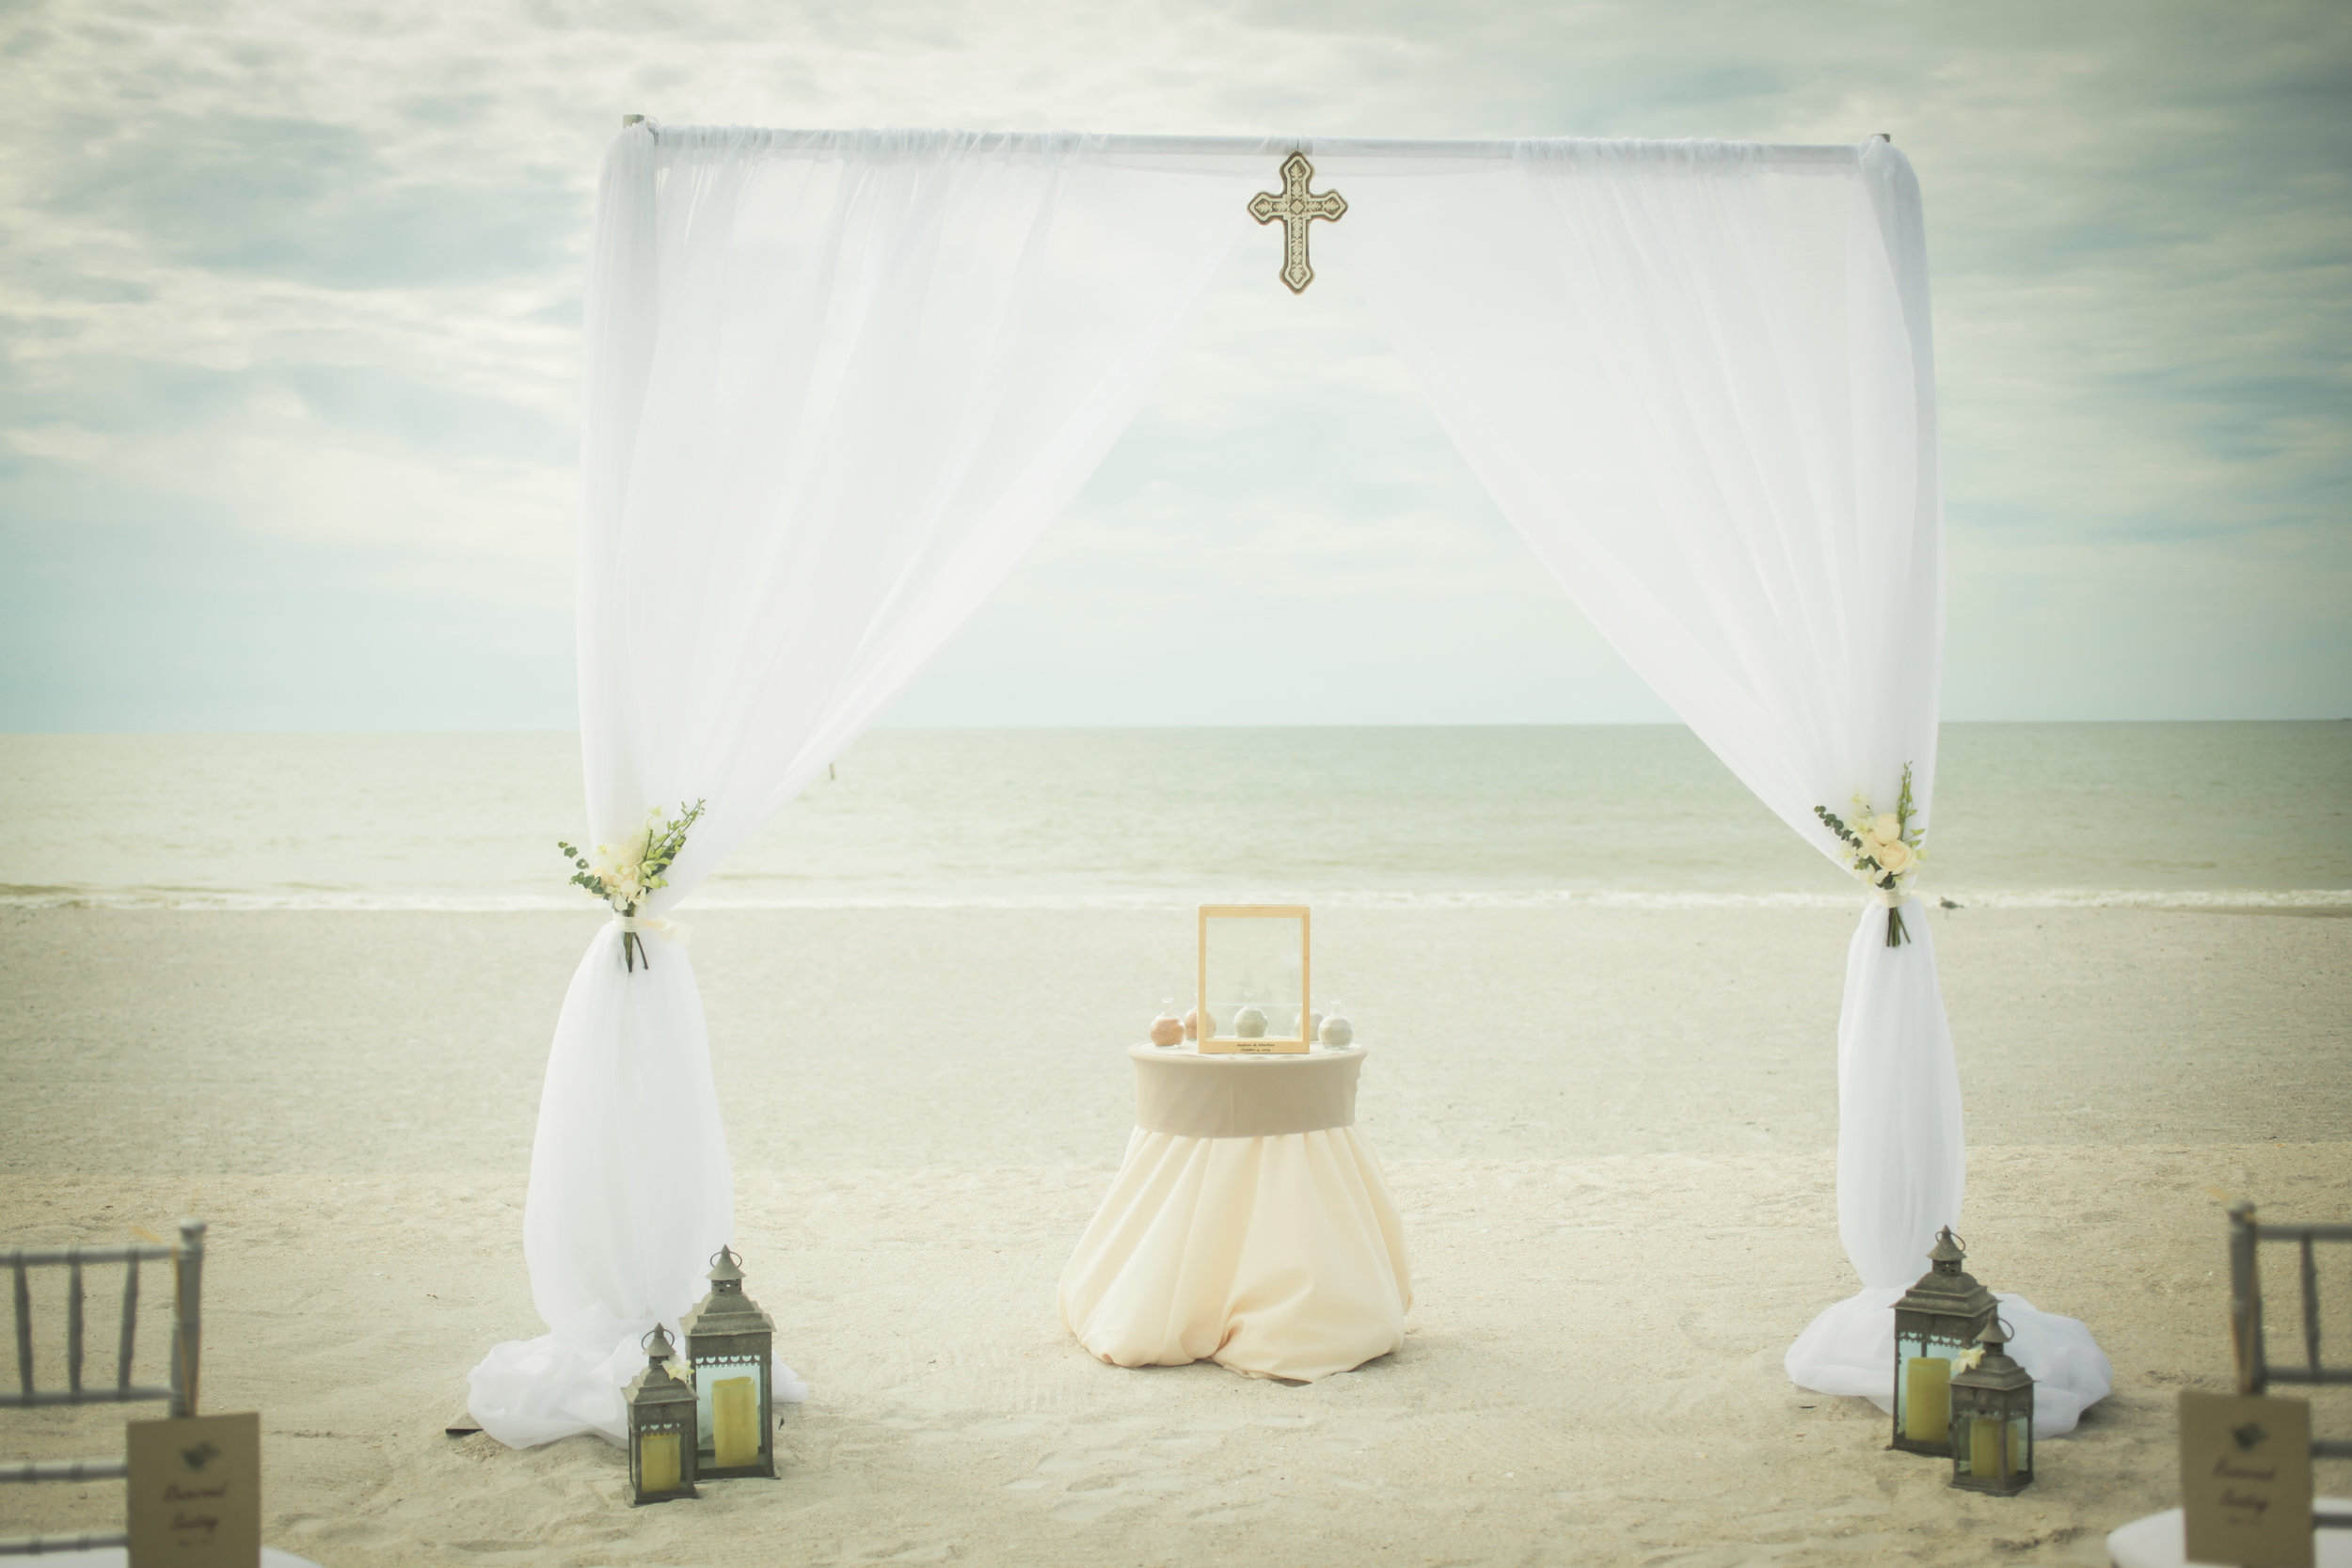 winsor event studio draping arch beach